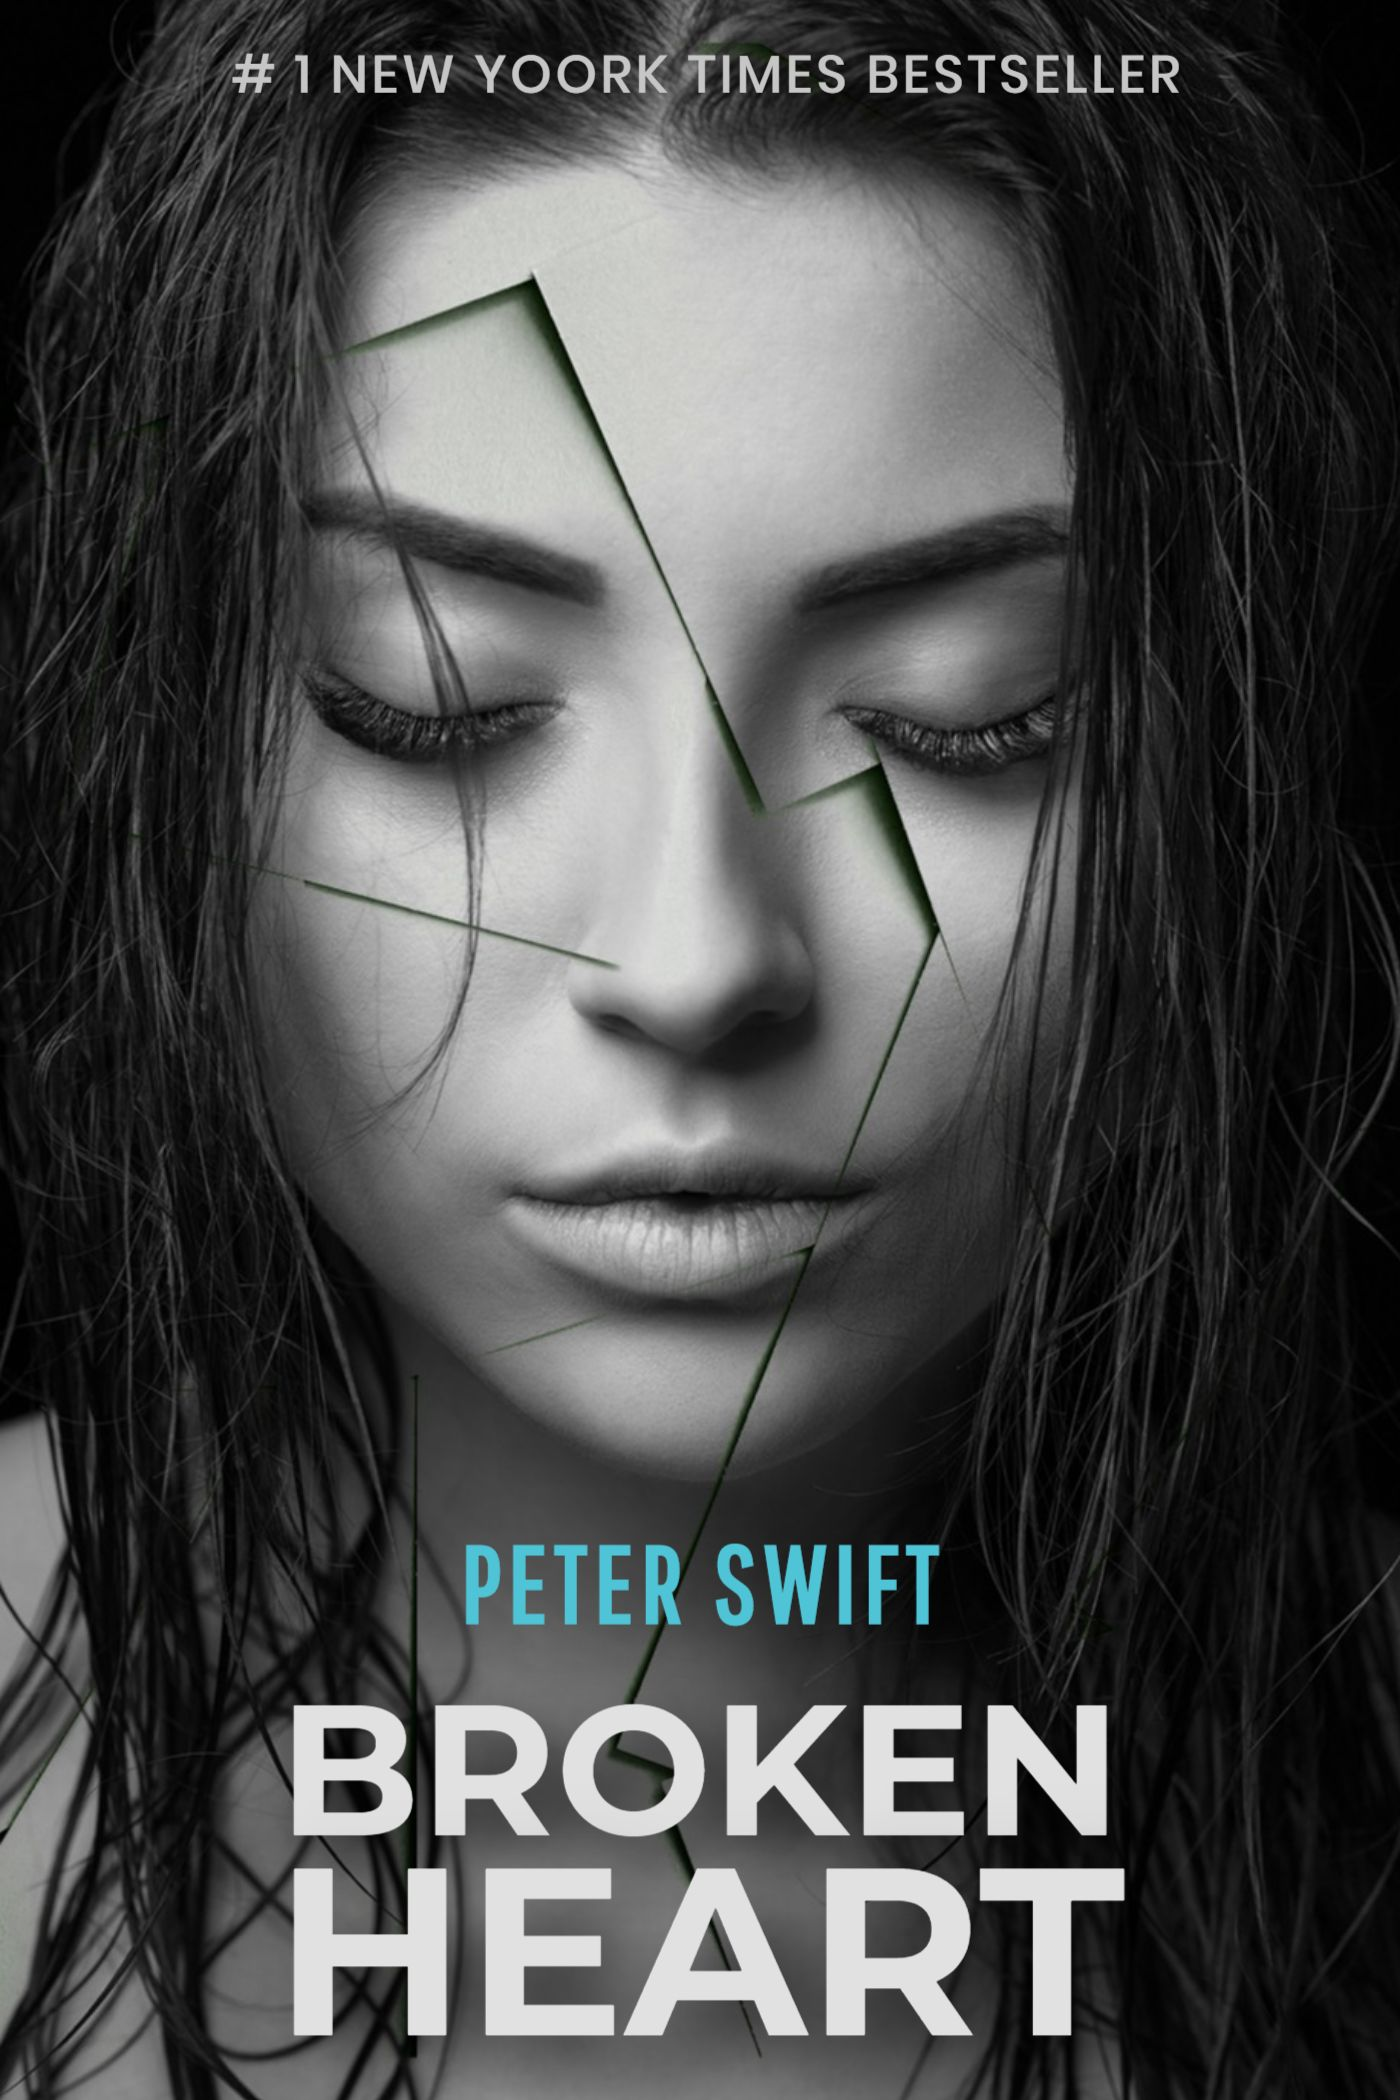 Broken Heart Book Cover Template